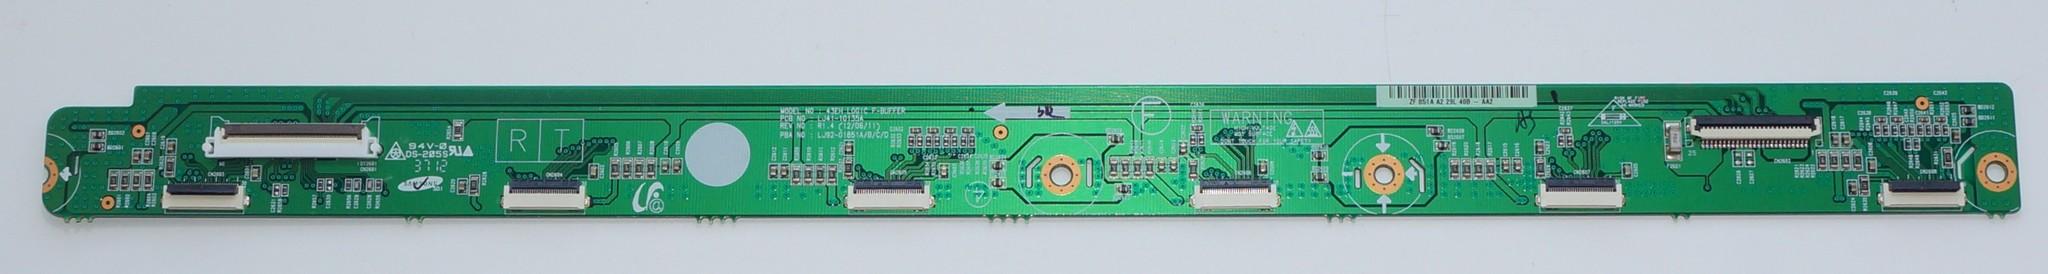 LJ41-10135A REV1.4 (LJ92-01851A) F-Buffer Samsung